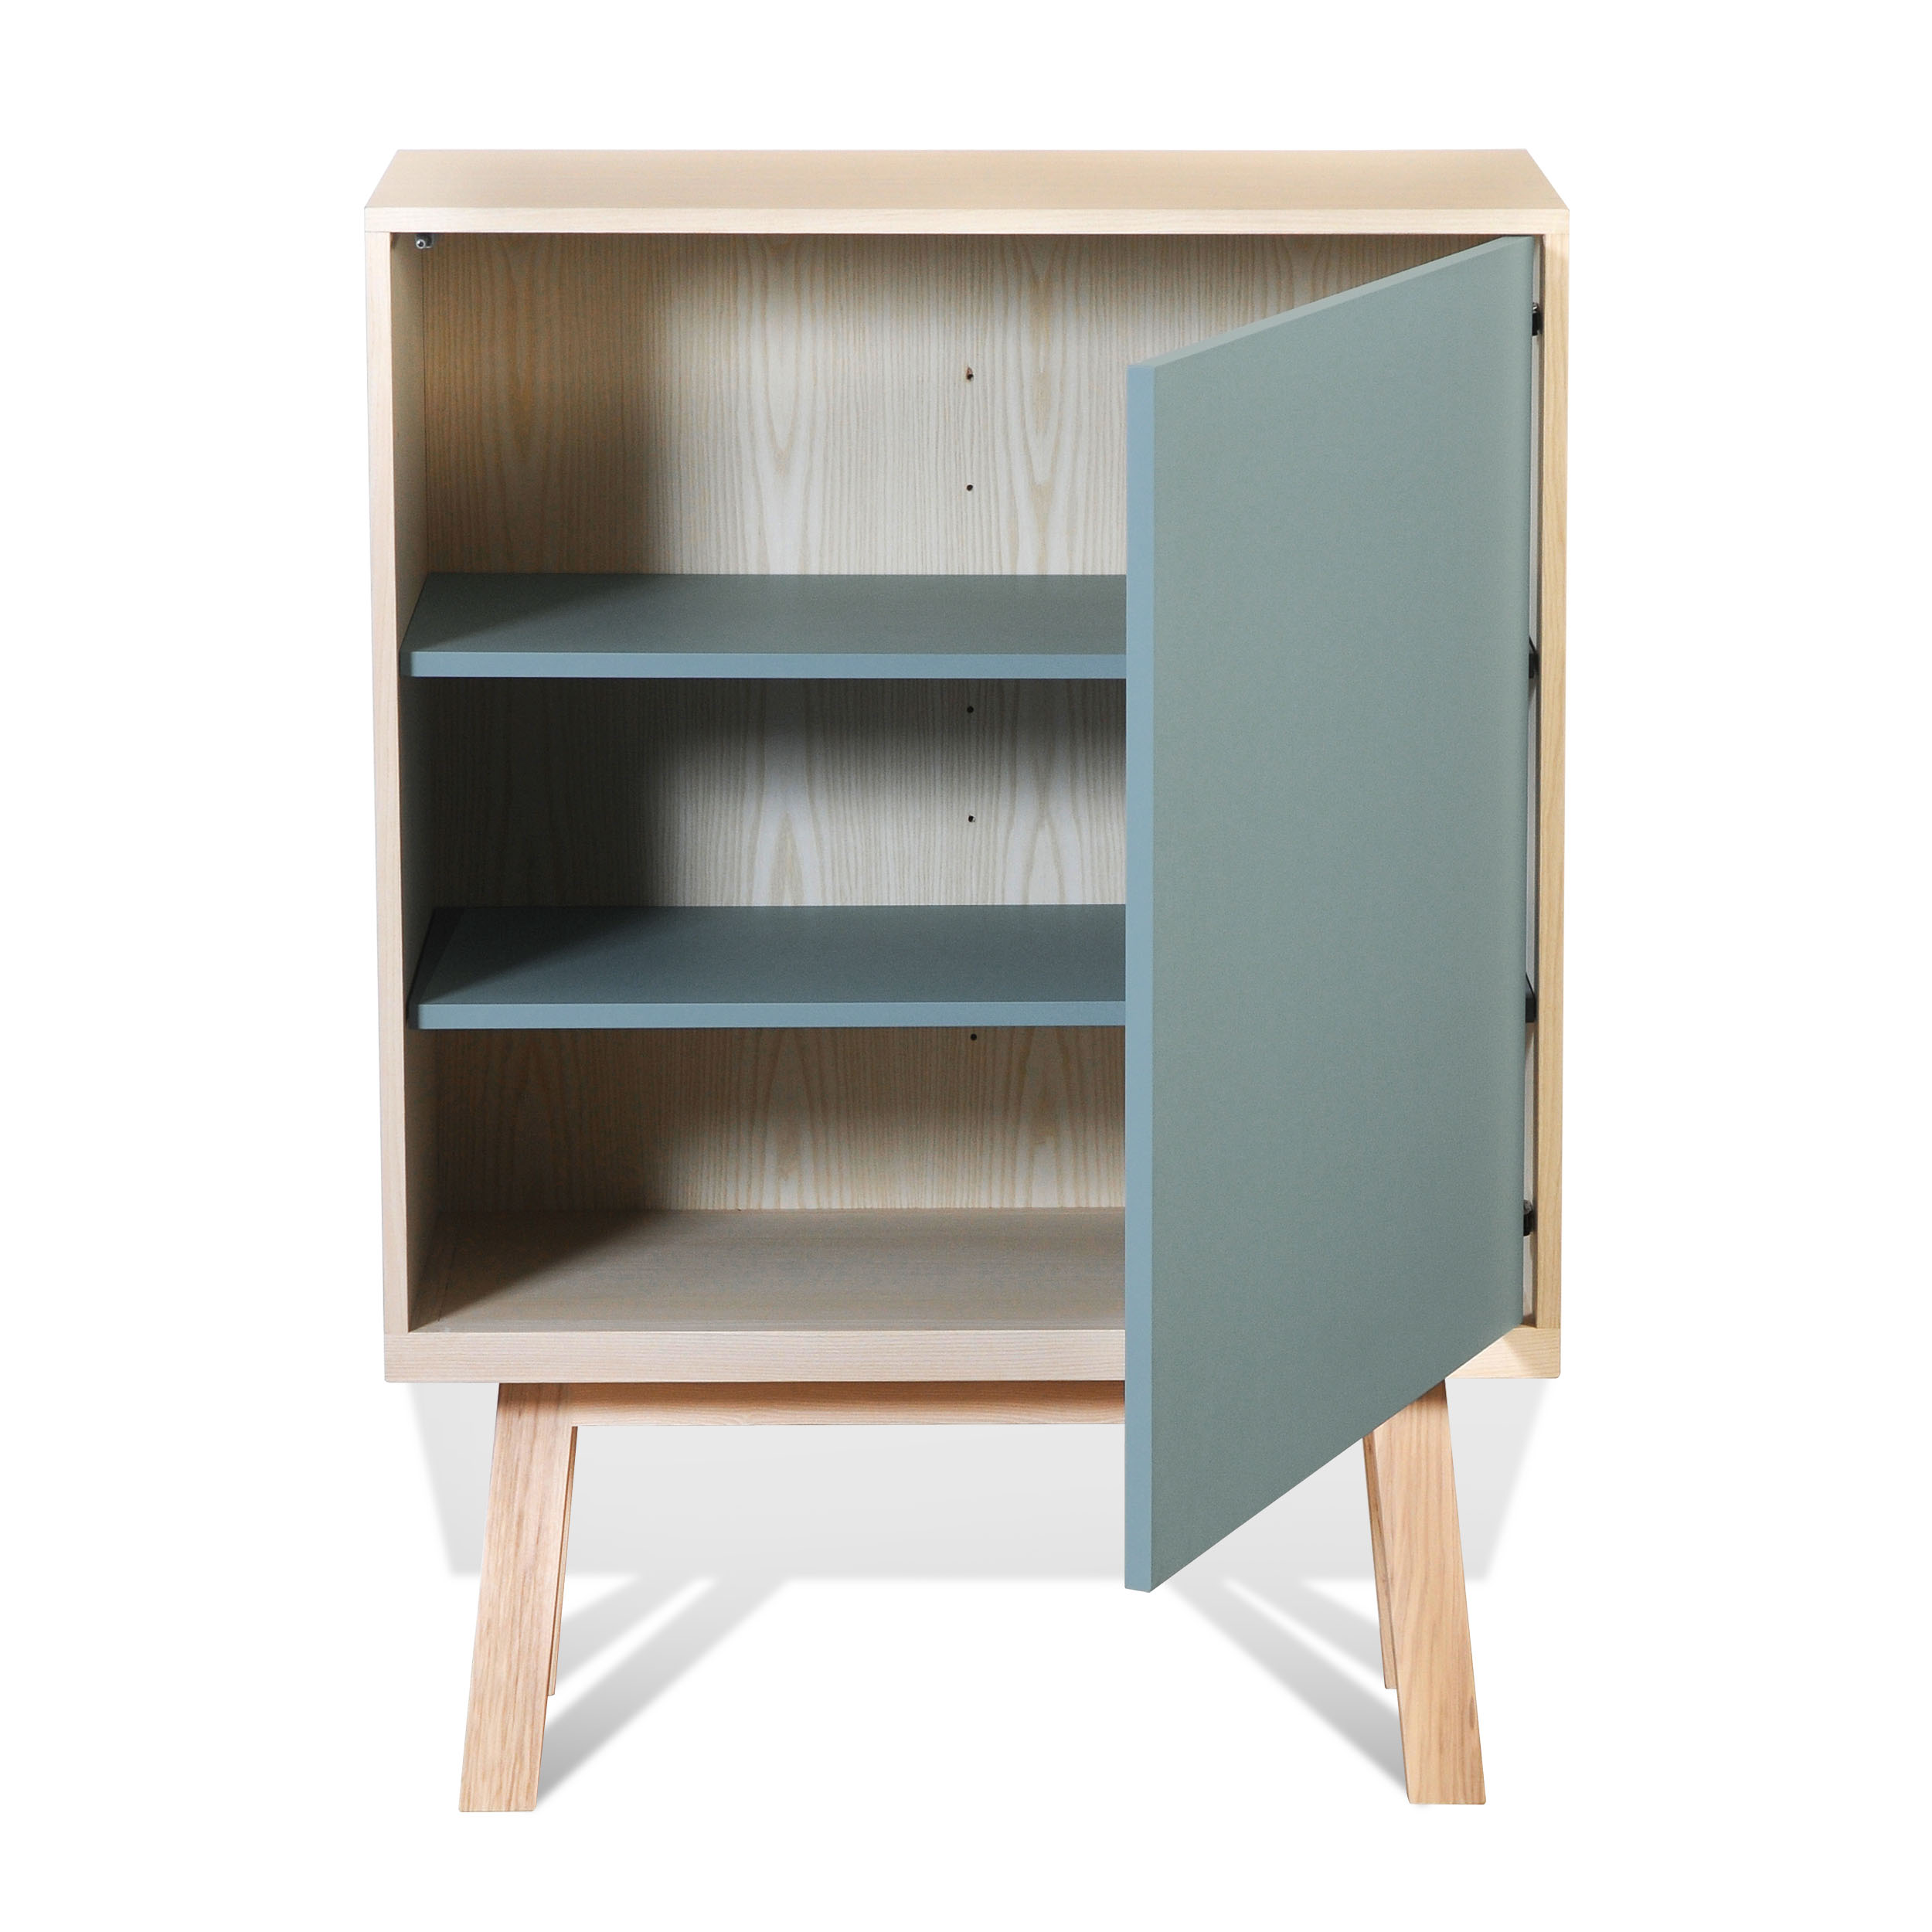 Armoire 1 porte en bois bleu briac (photo)